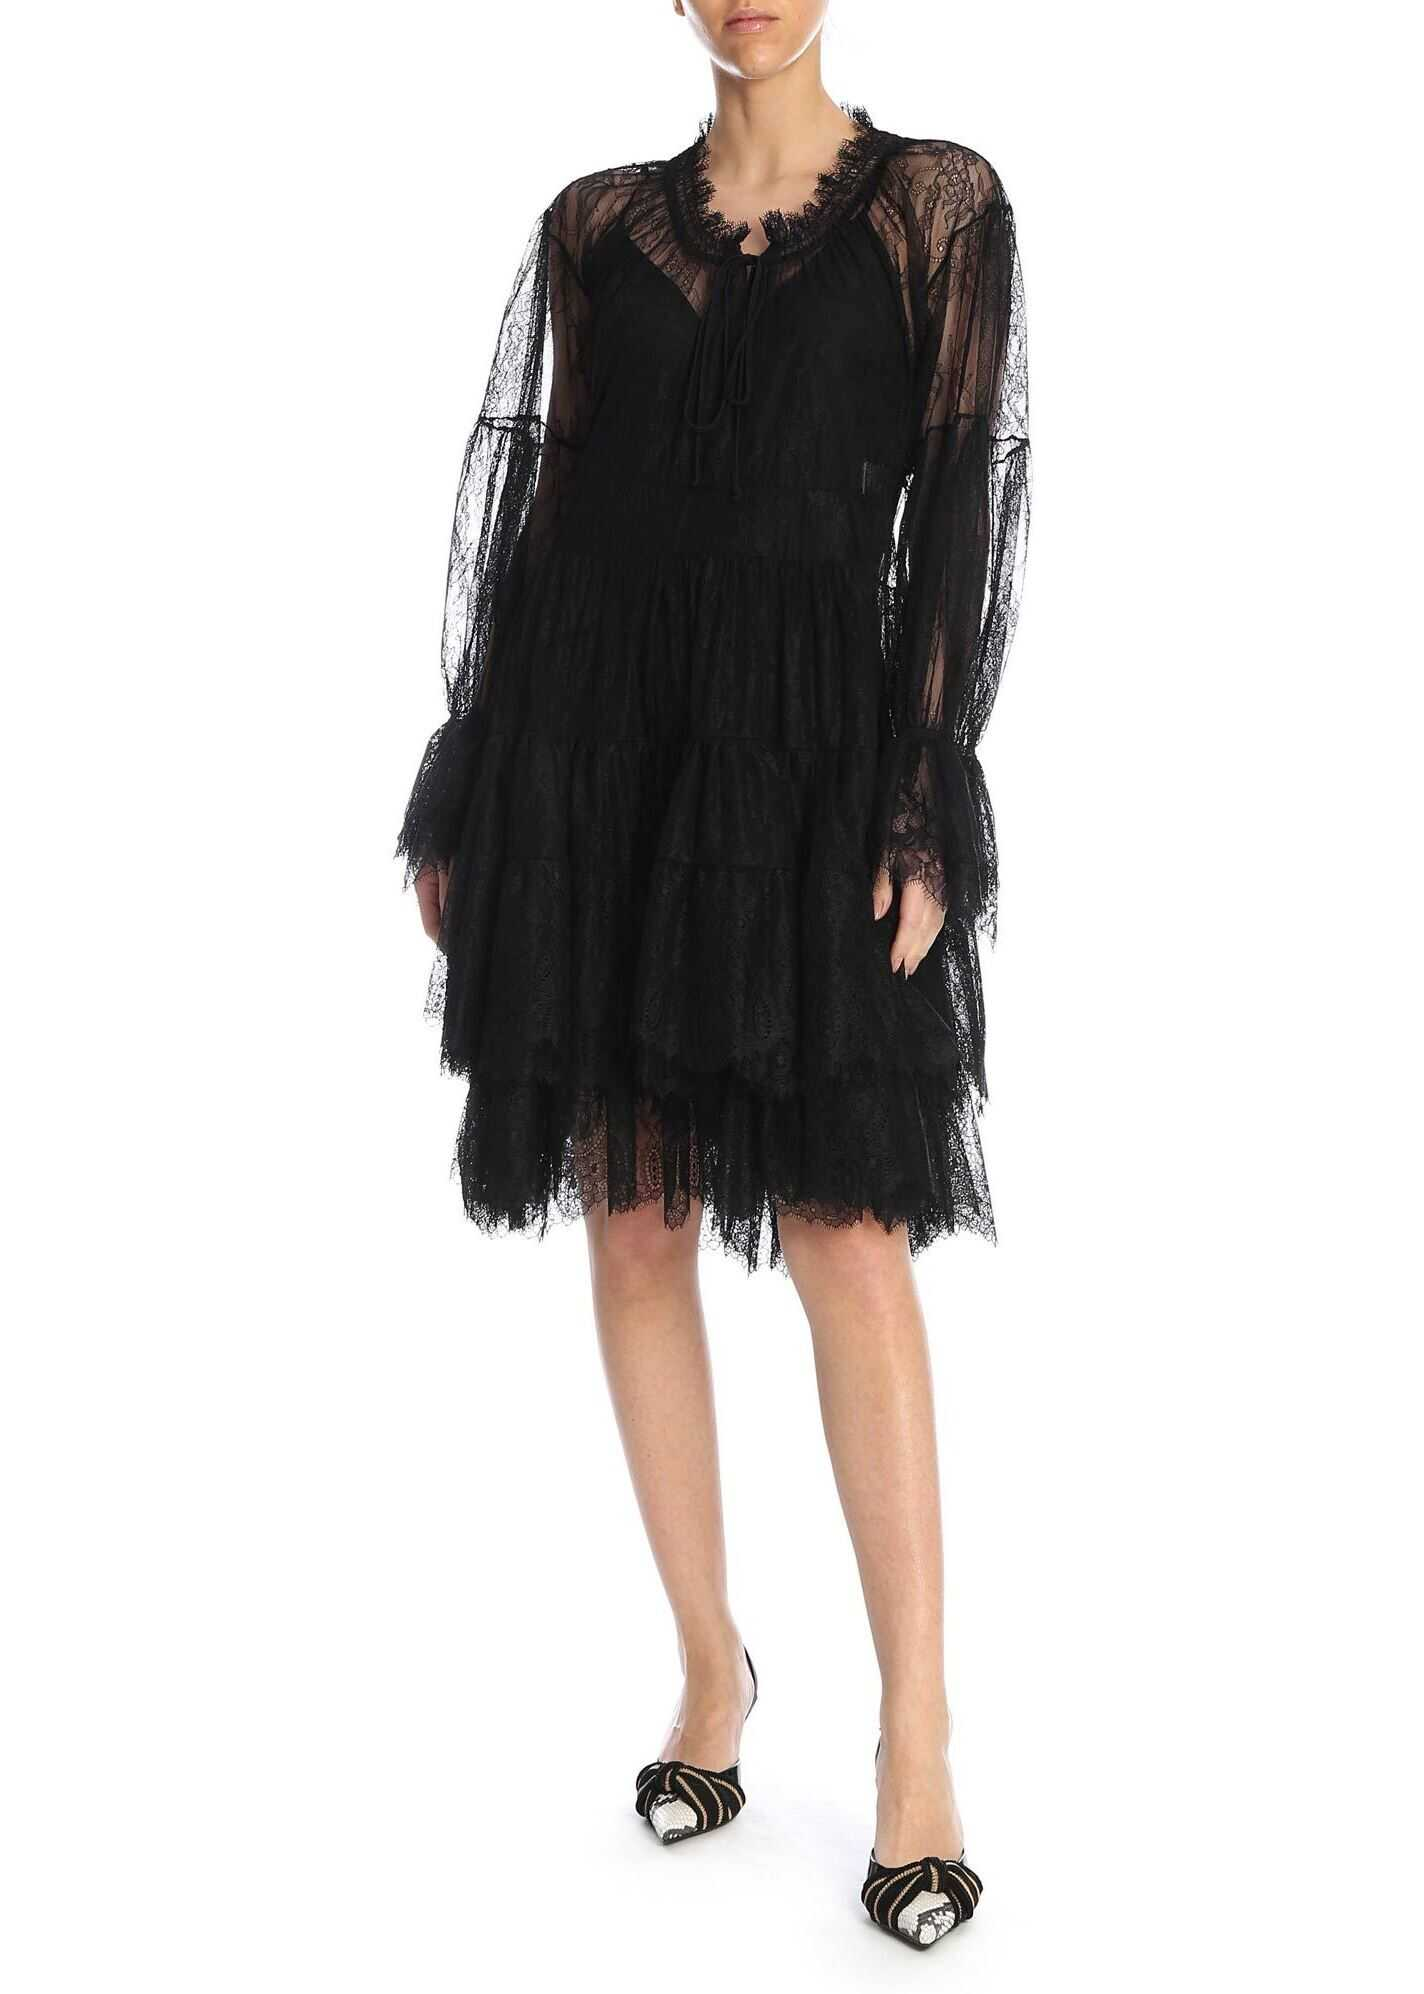 Ermanno Scervino Lace Dress With Flounces In Black Black